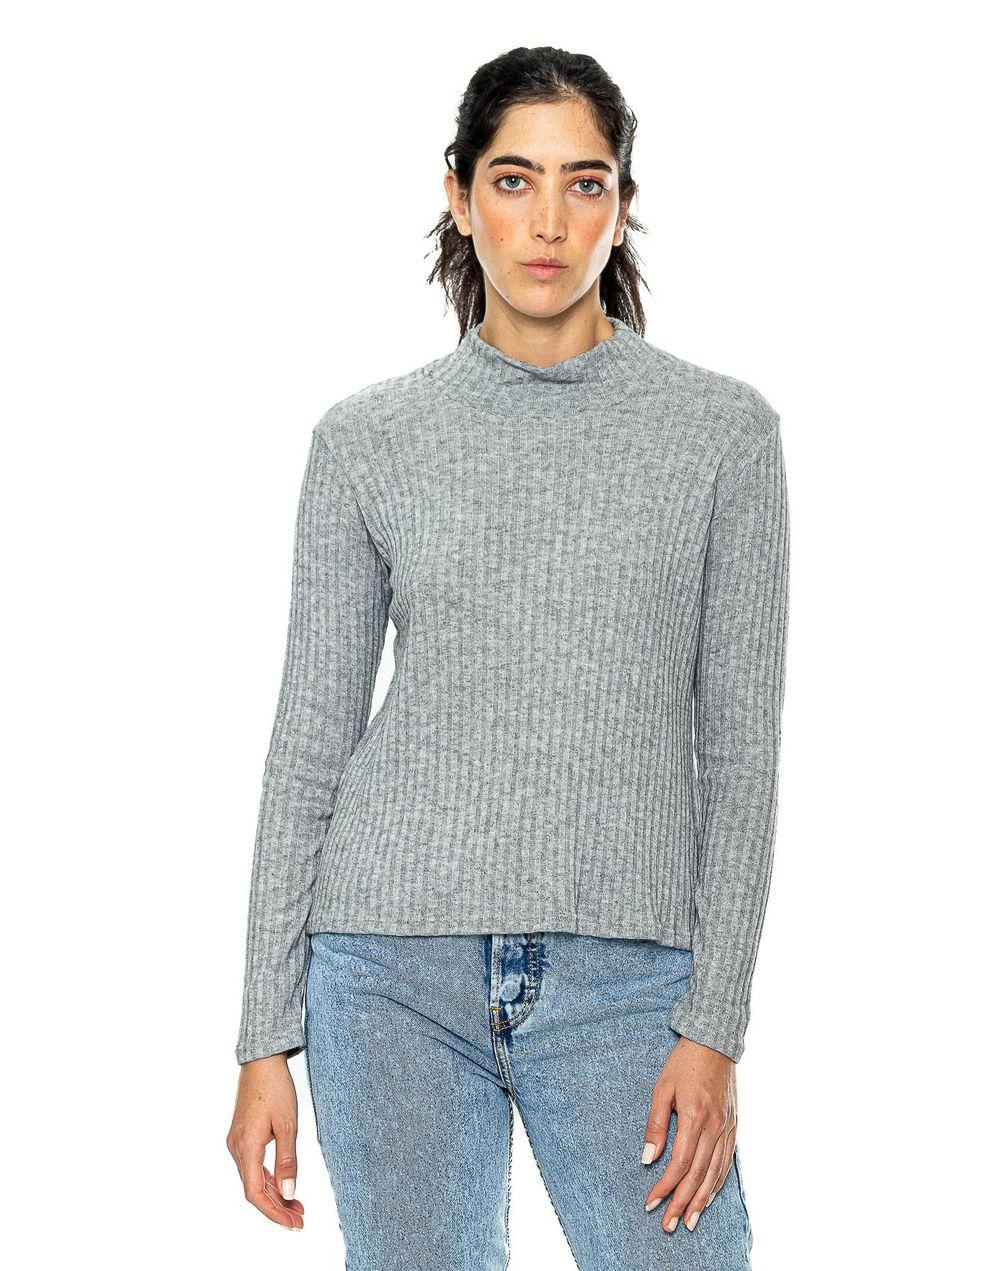 camiseta-180504-gris-1.jpg